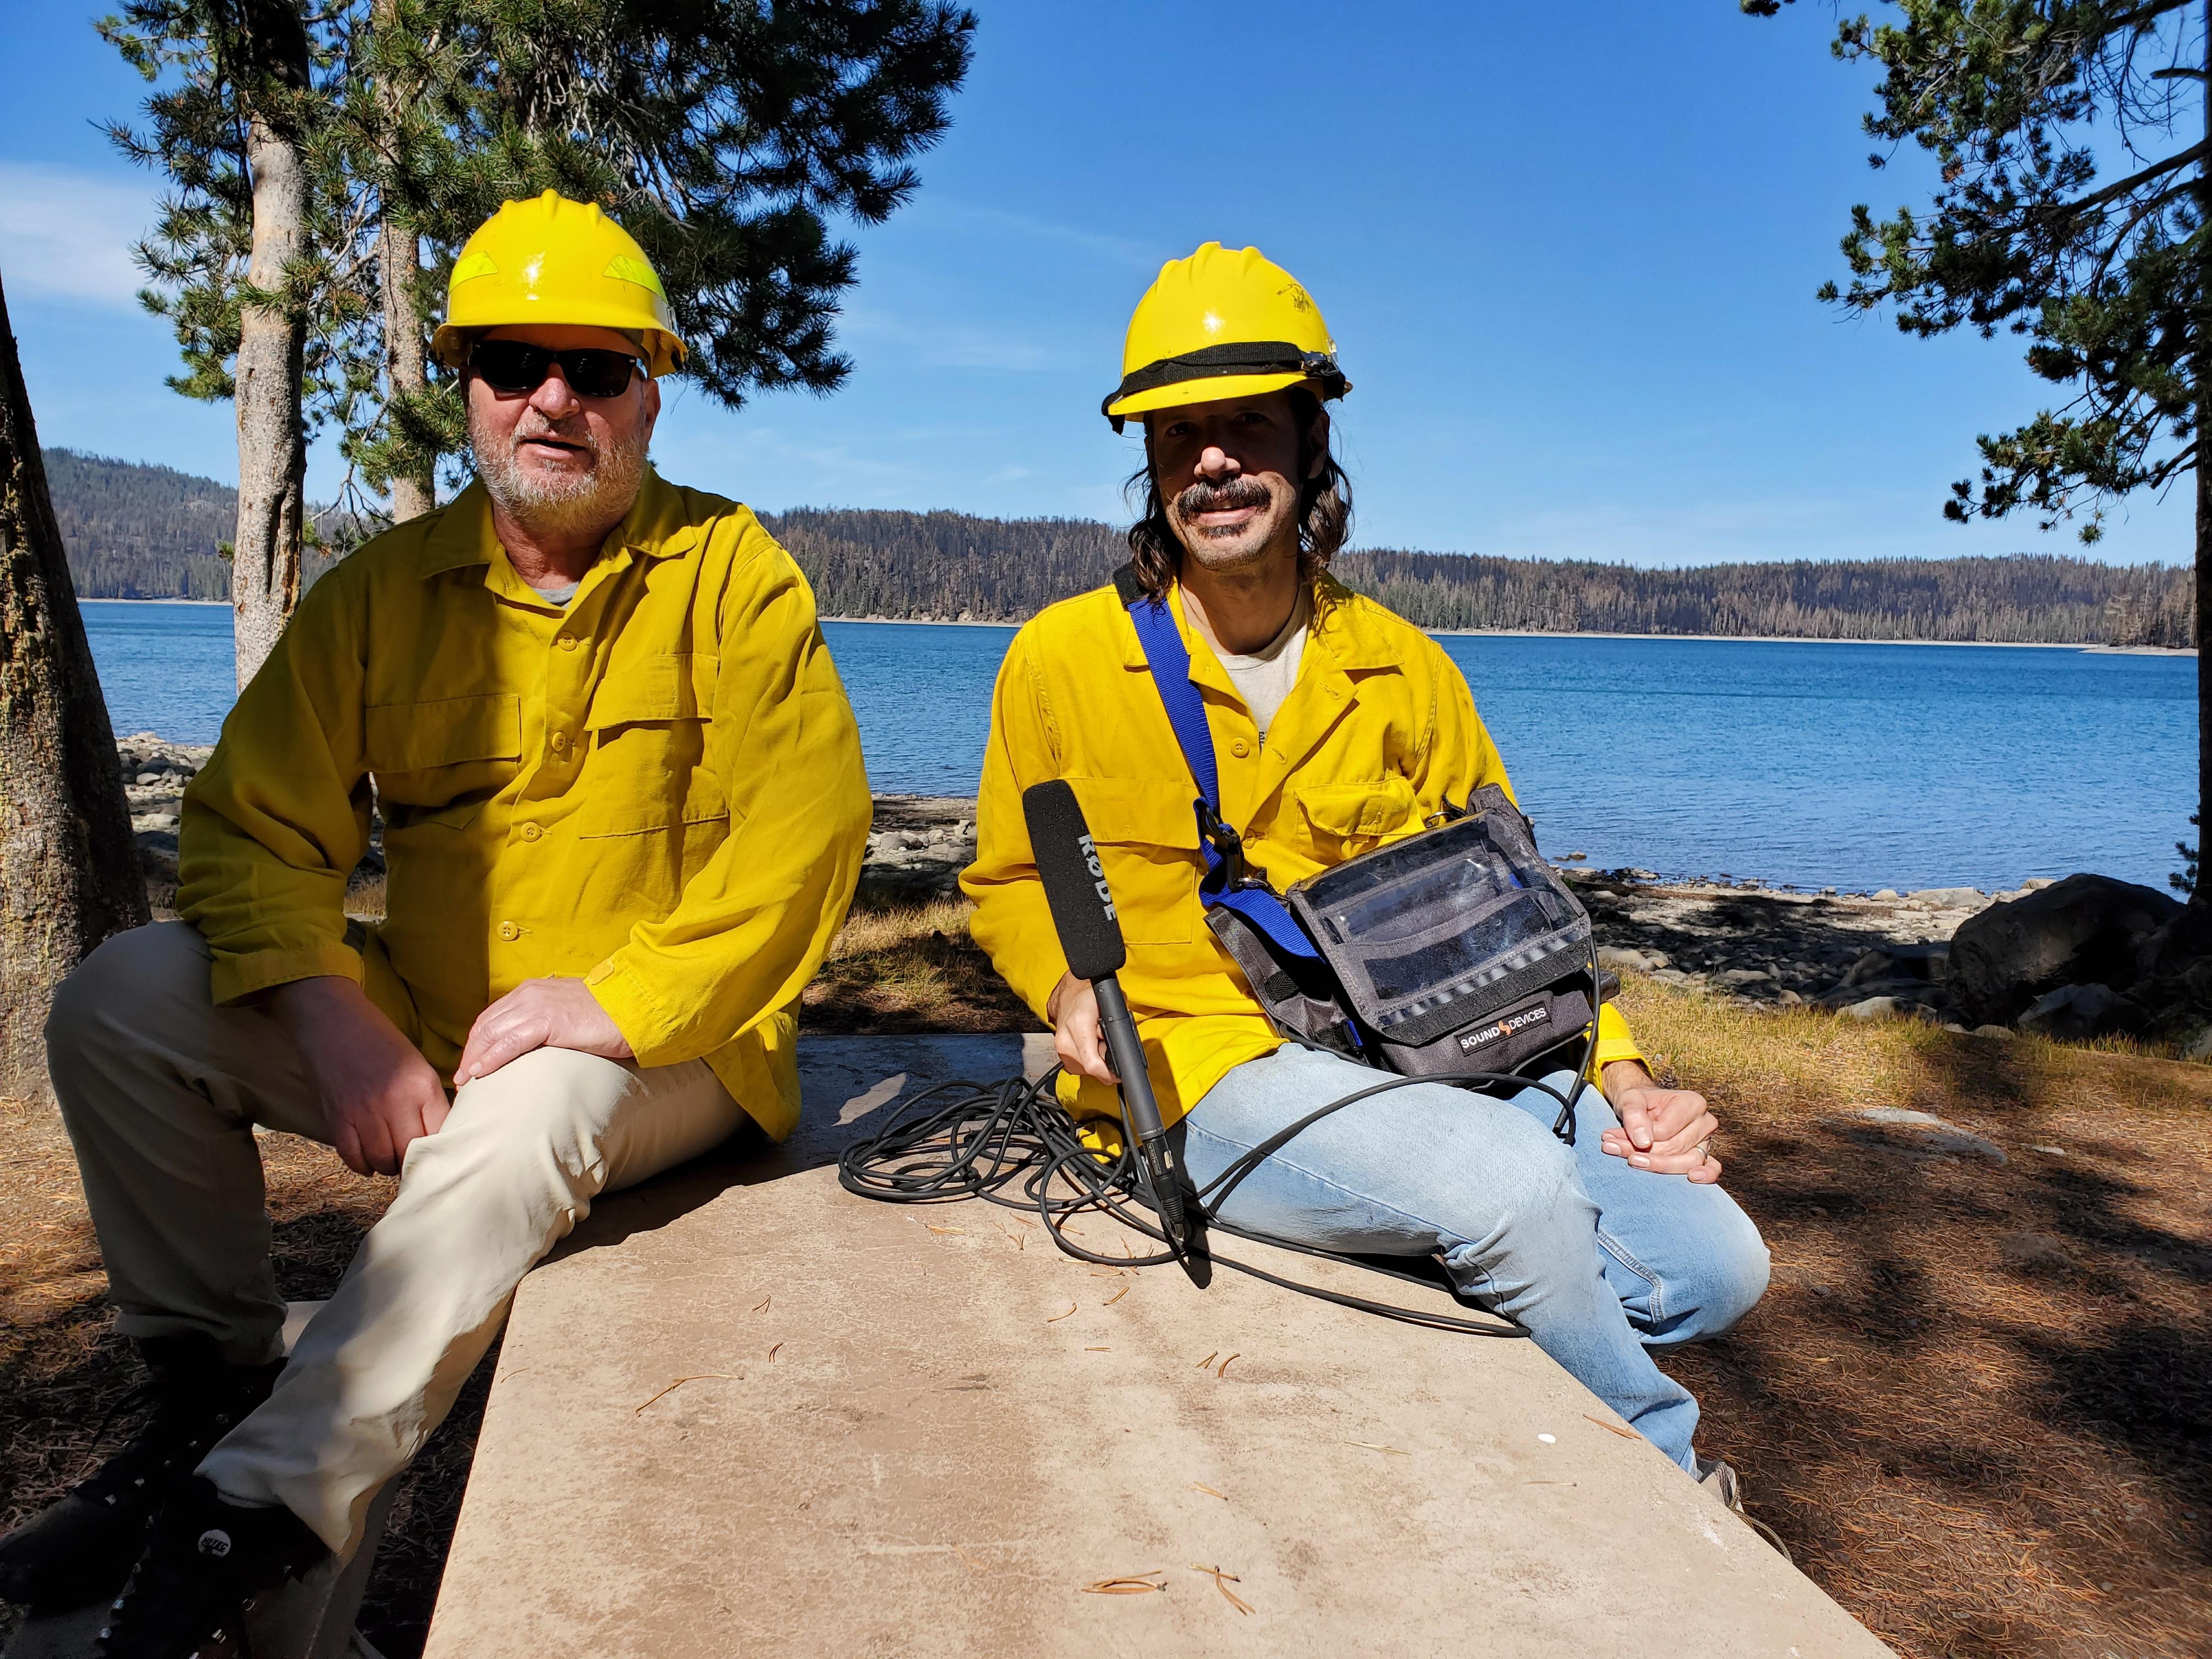 Caption: Dave and Matt at the Juniper Lake Campgroud